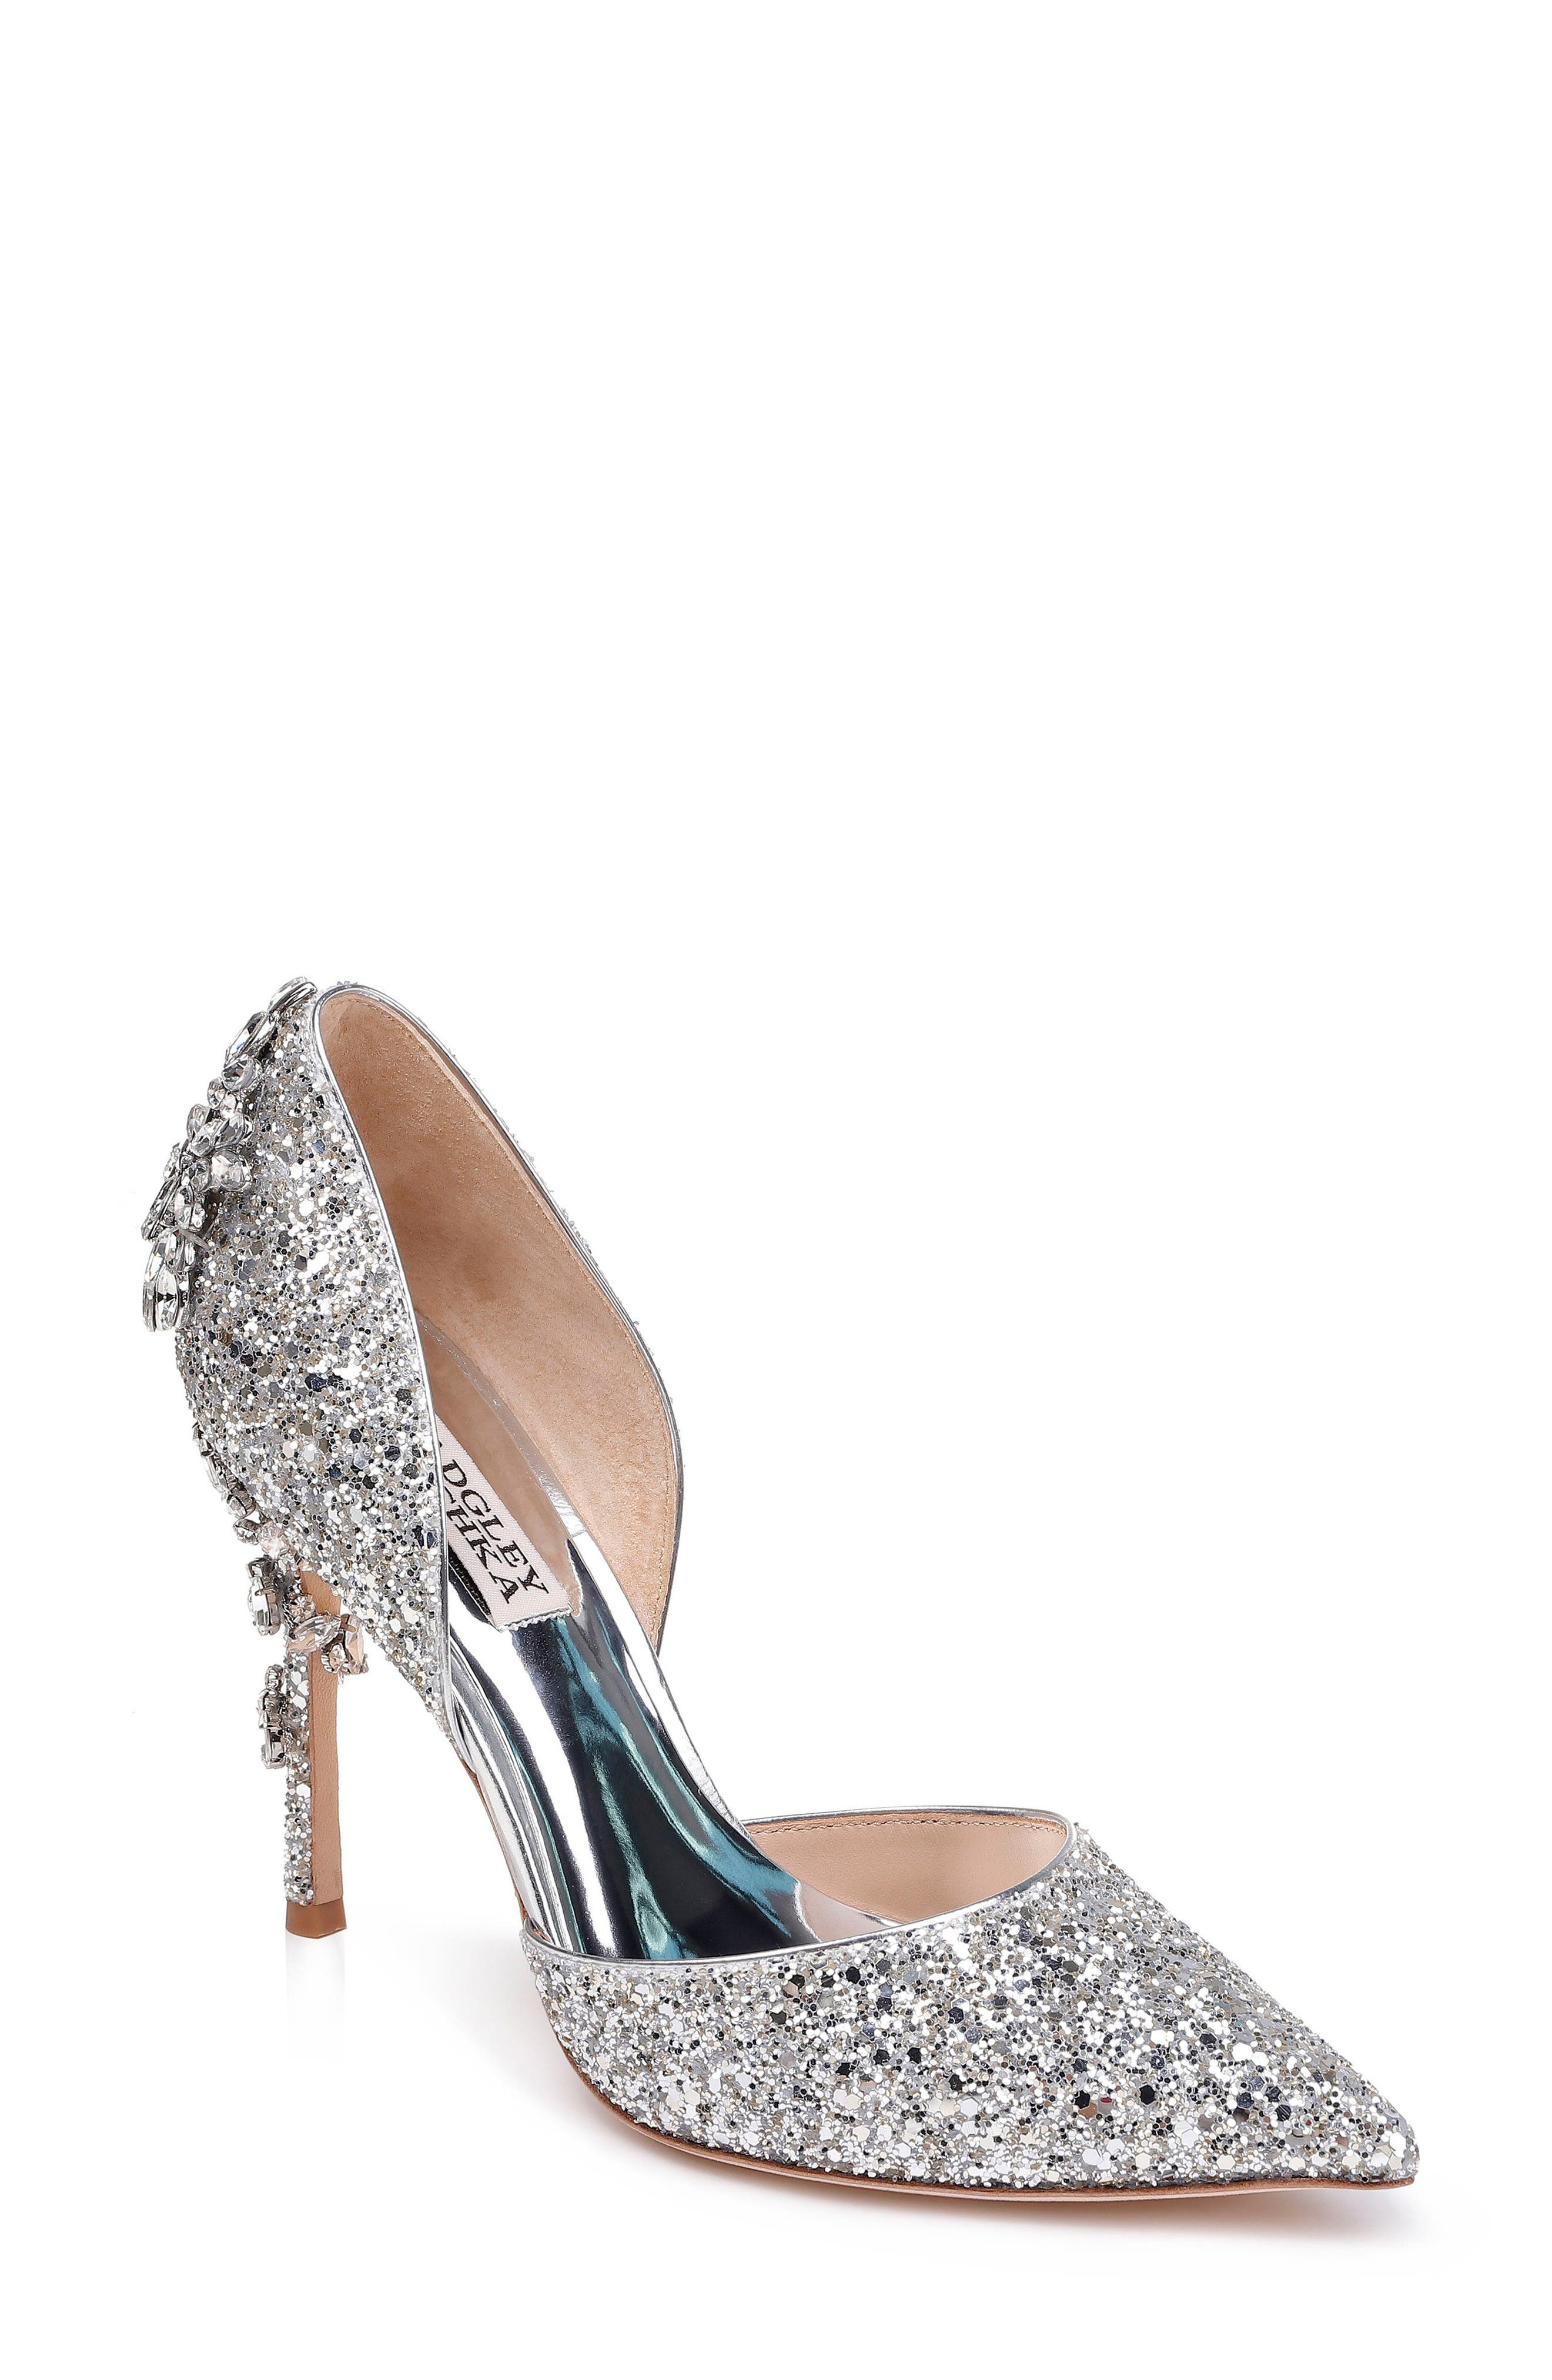 BADGLEY MISCHKA Vogue Iii Glitter Pumps in Silver Glitter